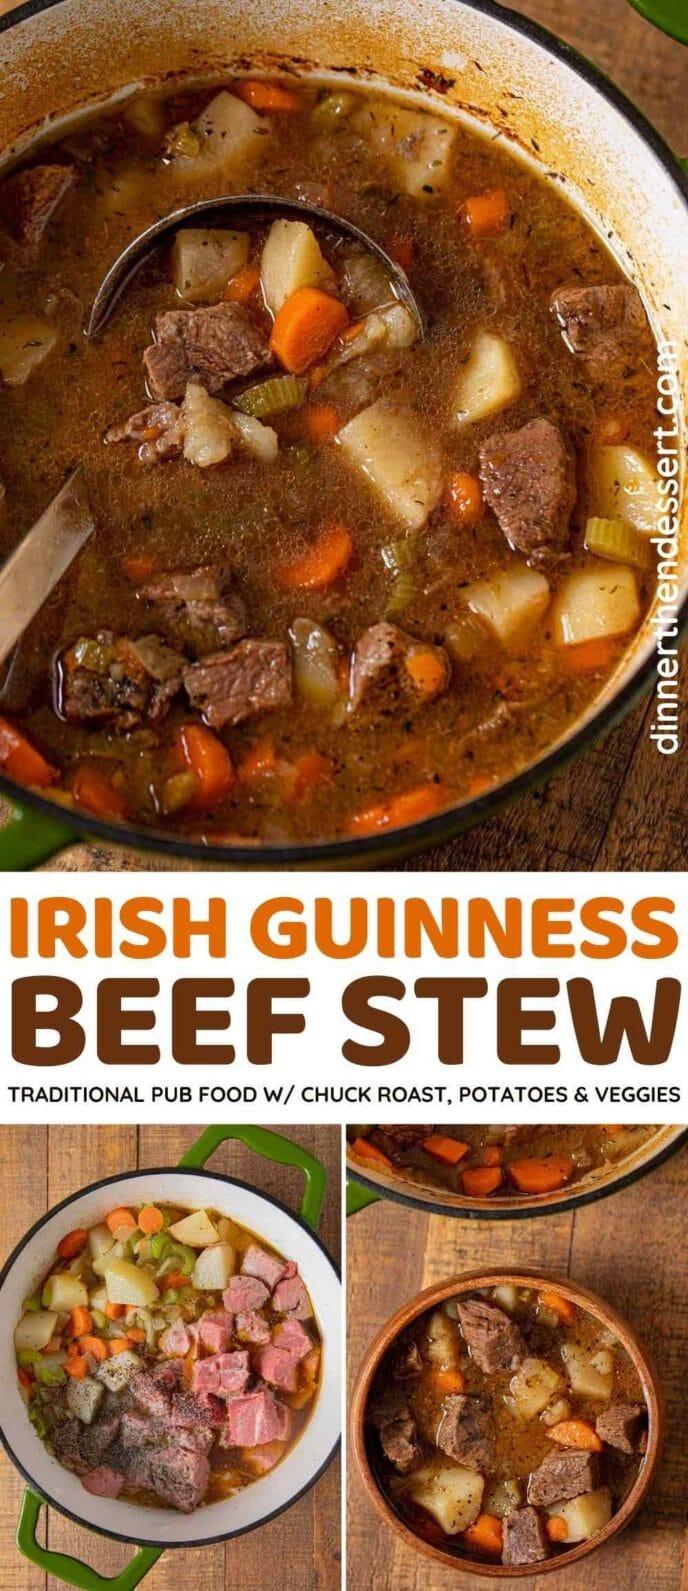 Irish Guinness Beef Stew collage